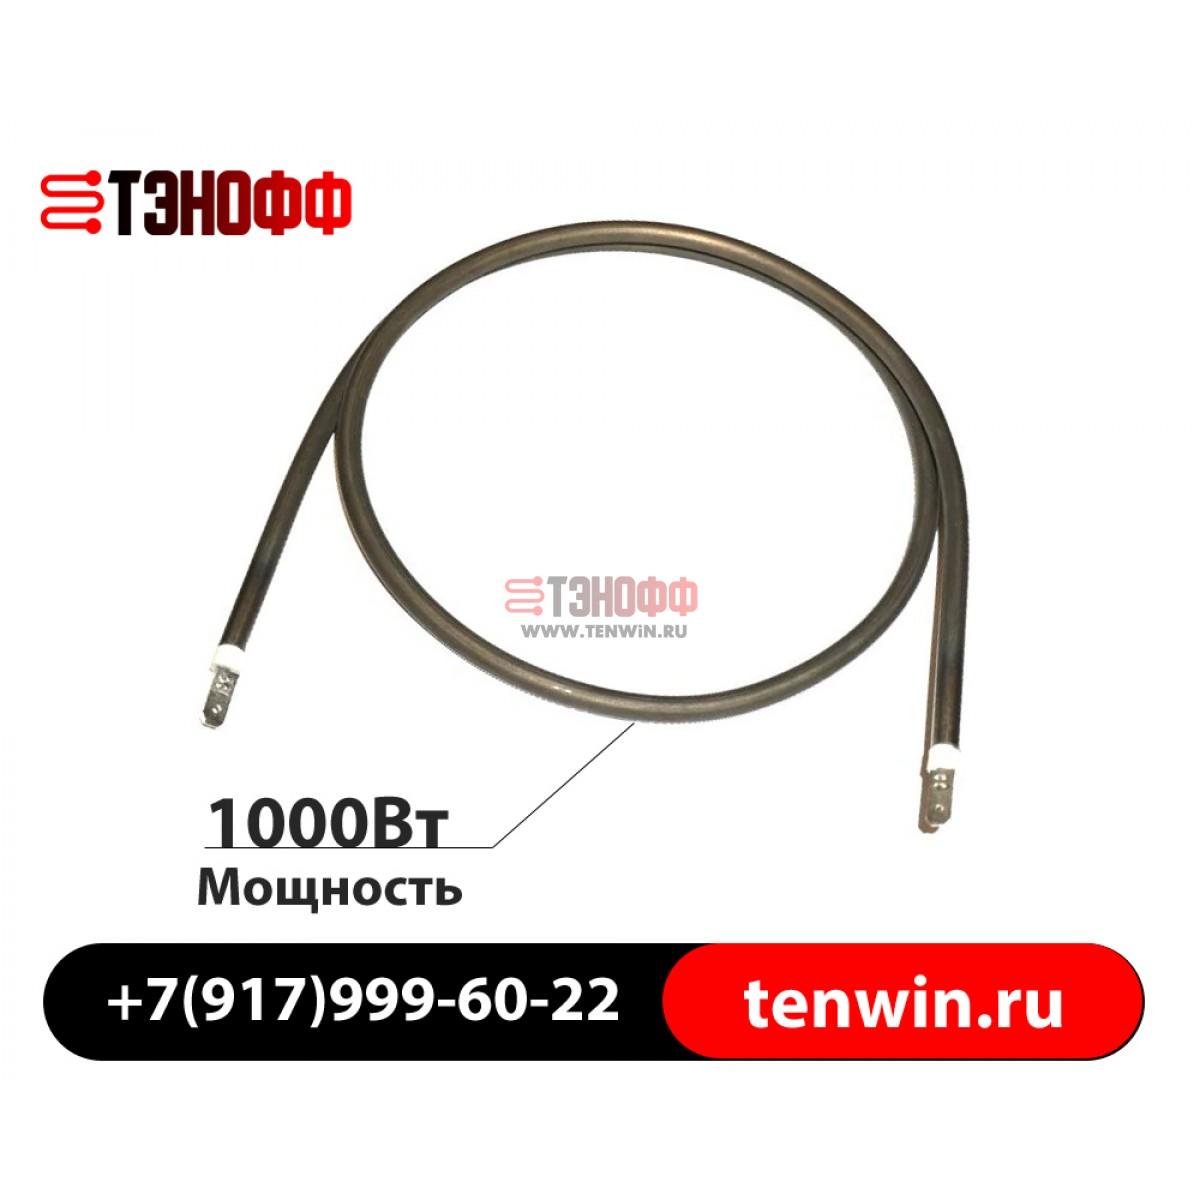 ТЭН 1000Вт воздушный гибкий - длина 1000мм